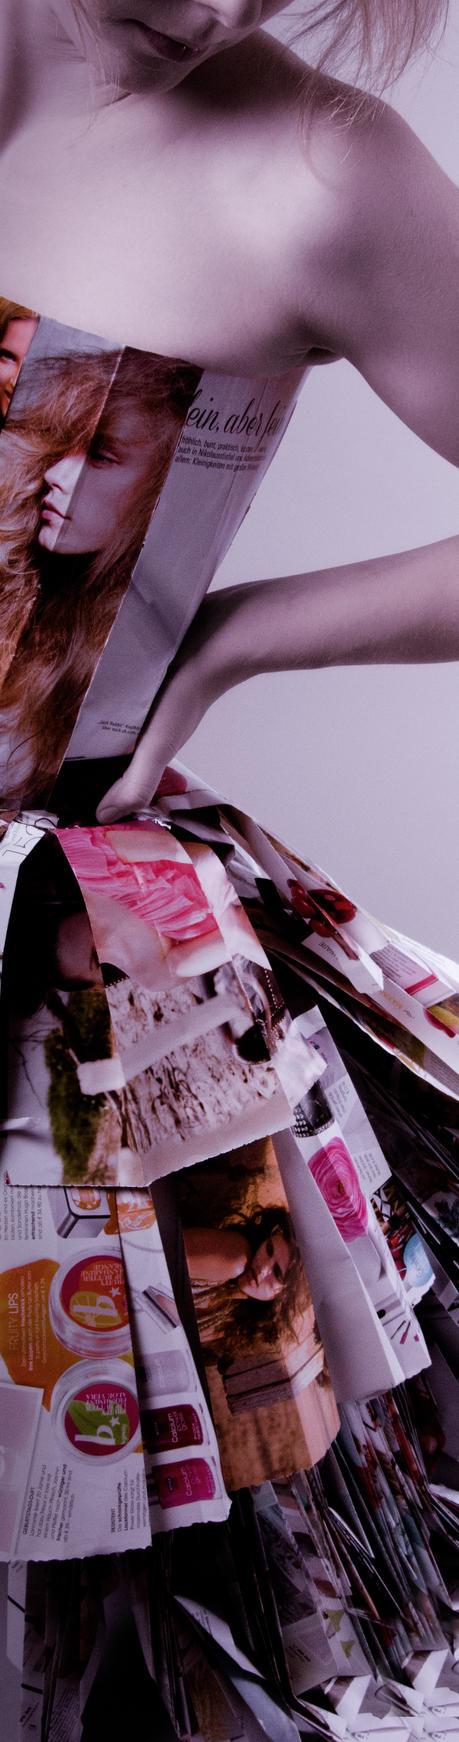 Paperdress 03 by milchzahnvampir